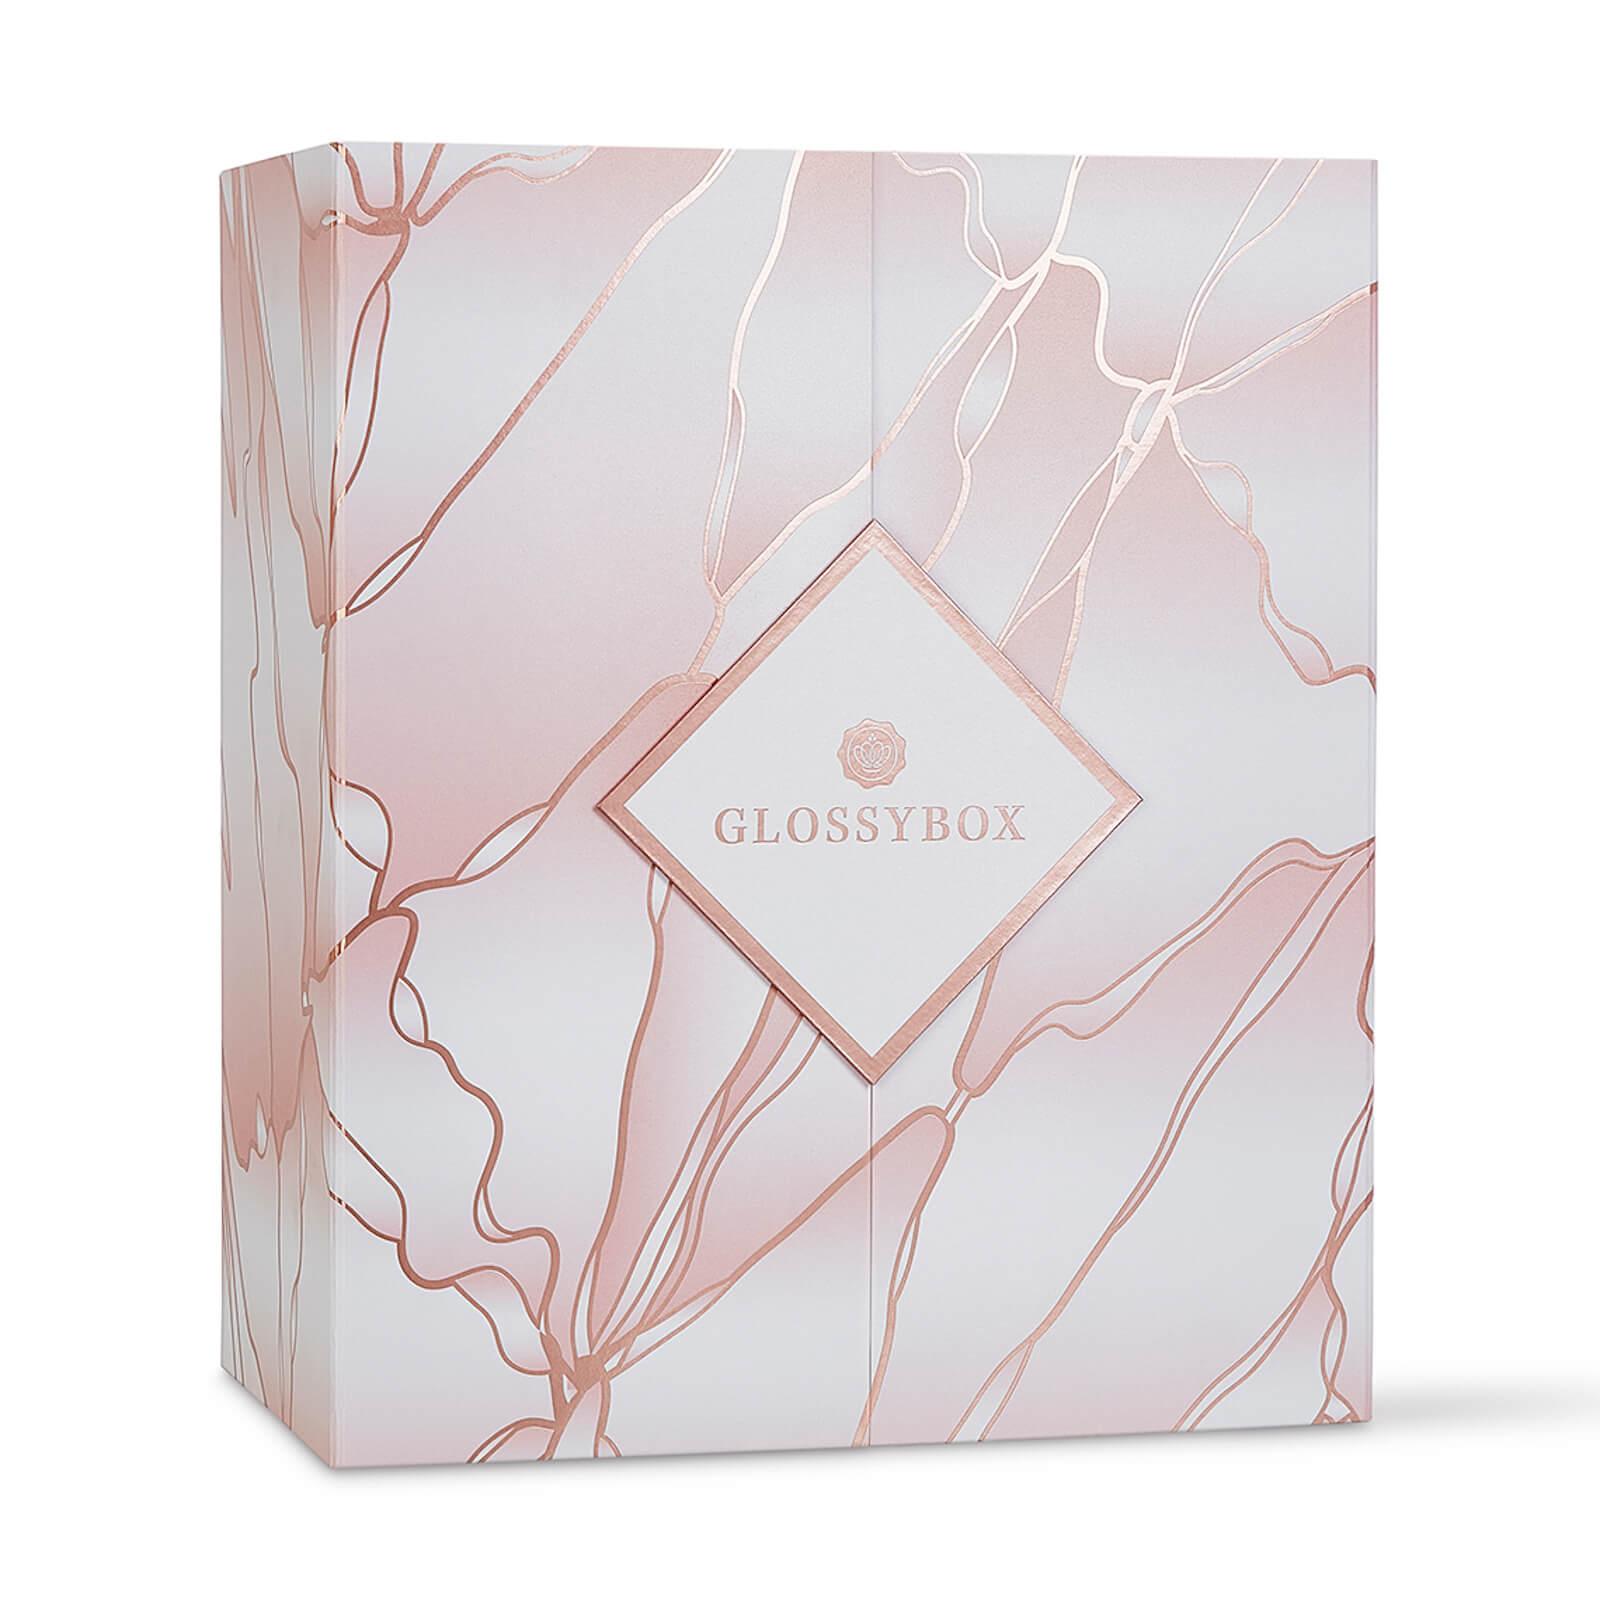 Glossy Box coupon: GLOSSYBOX Beauty Advent Calendar 2020